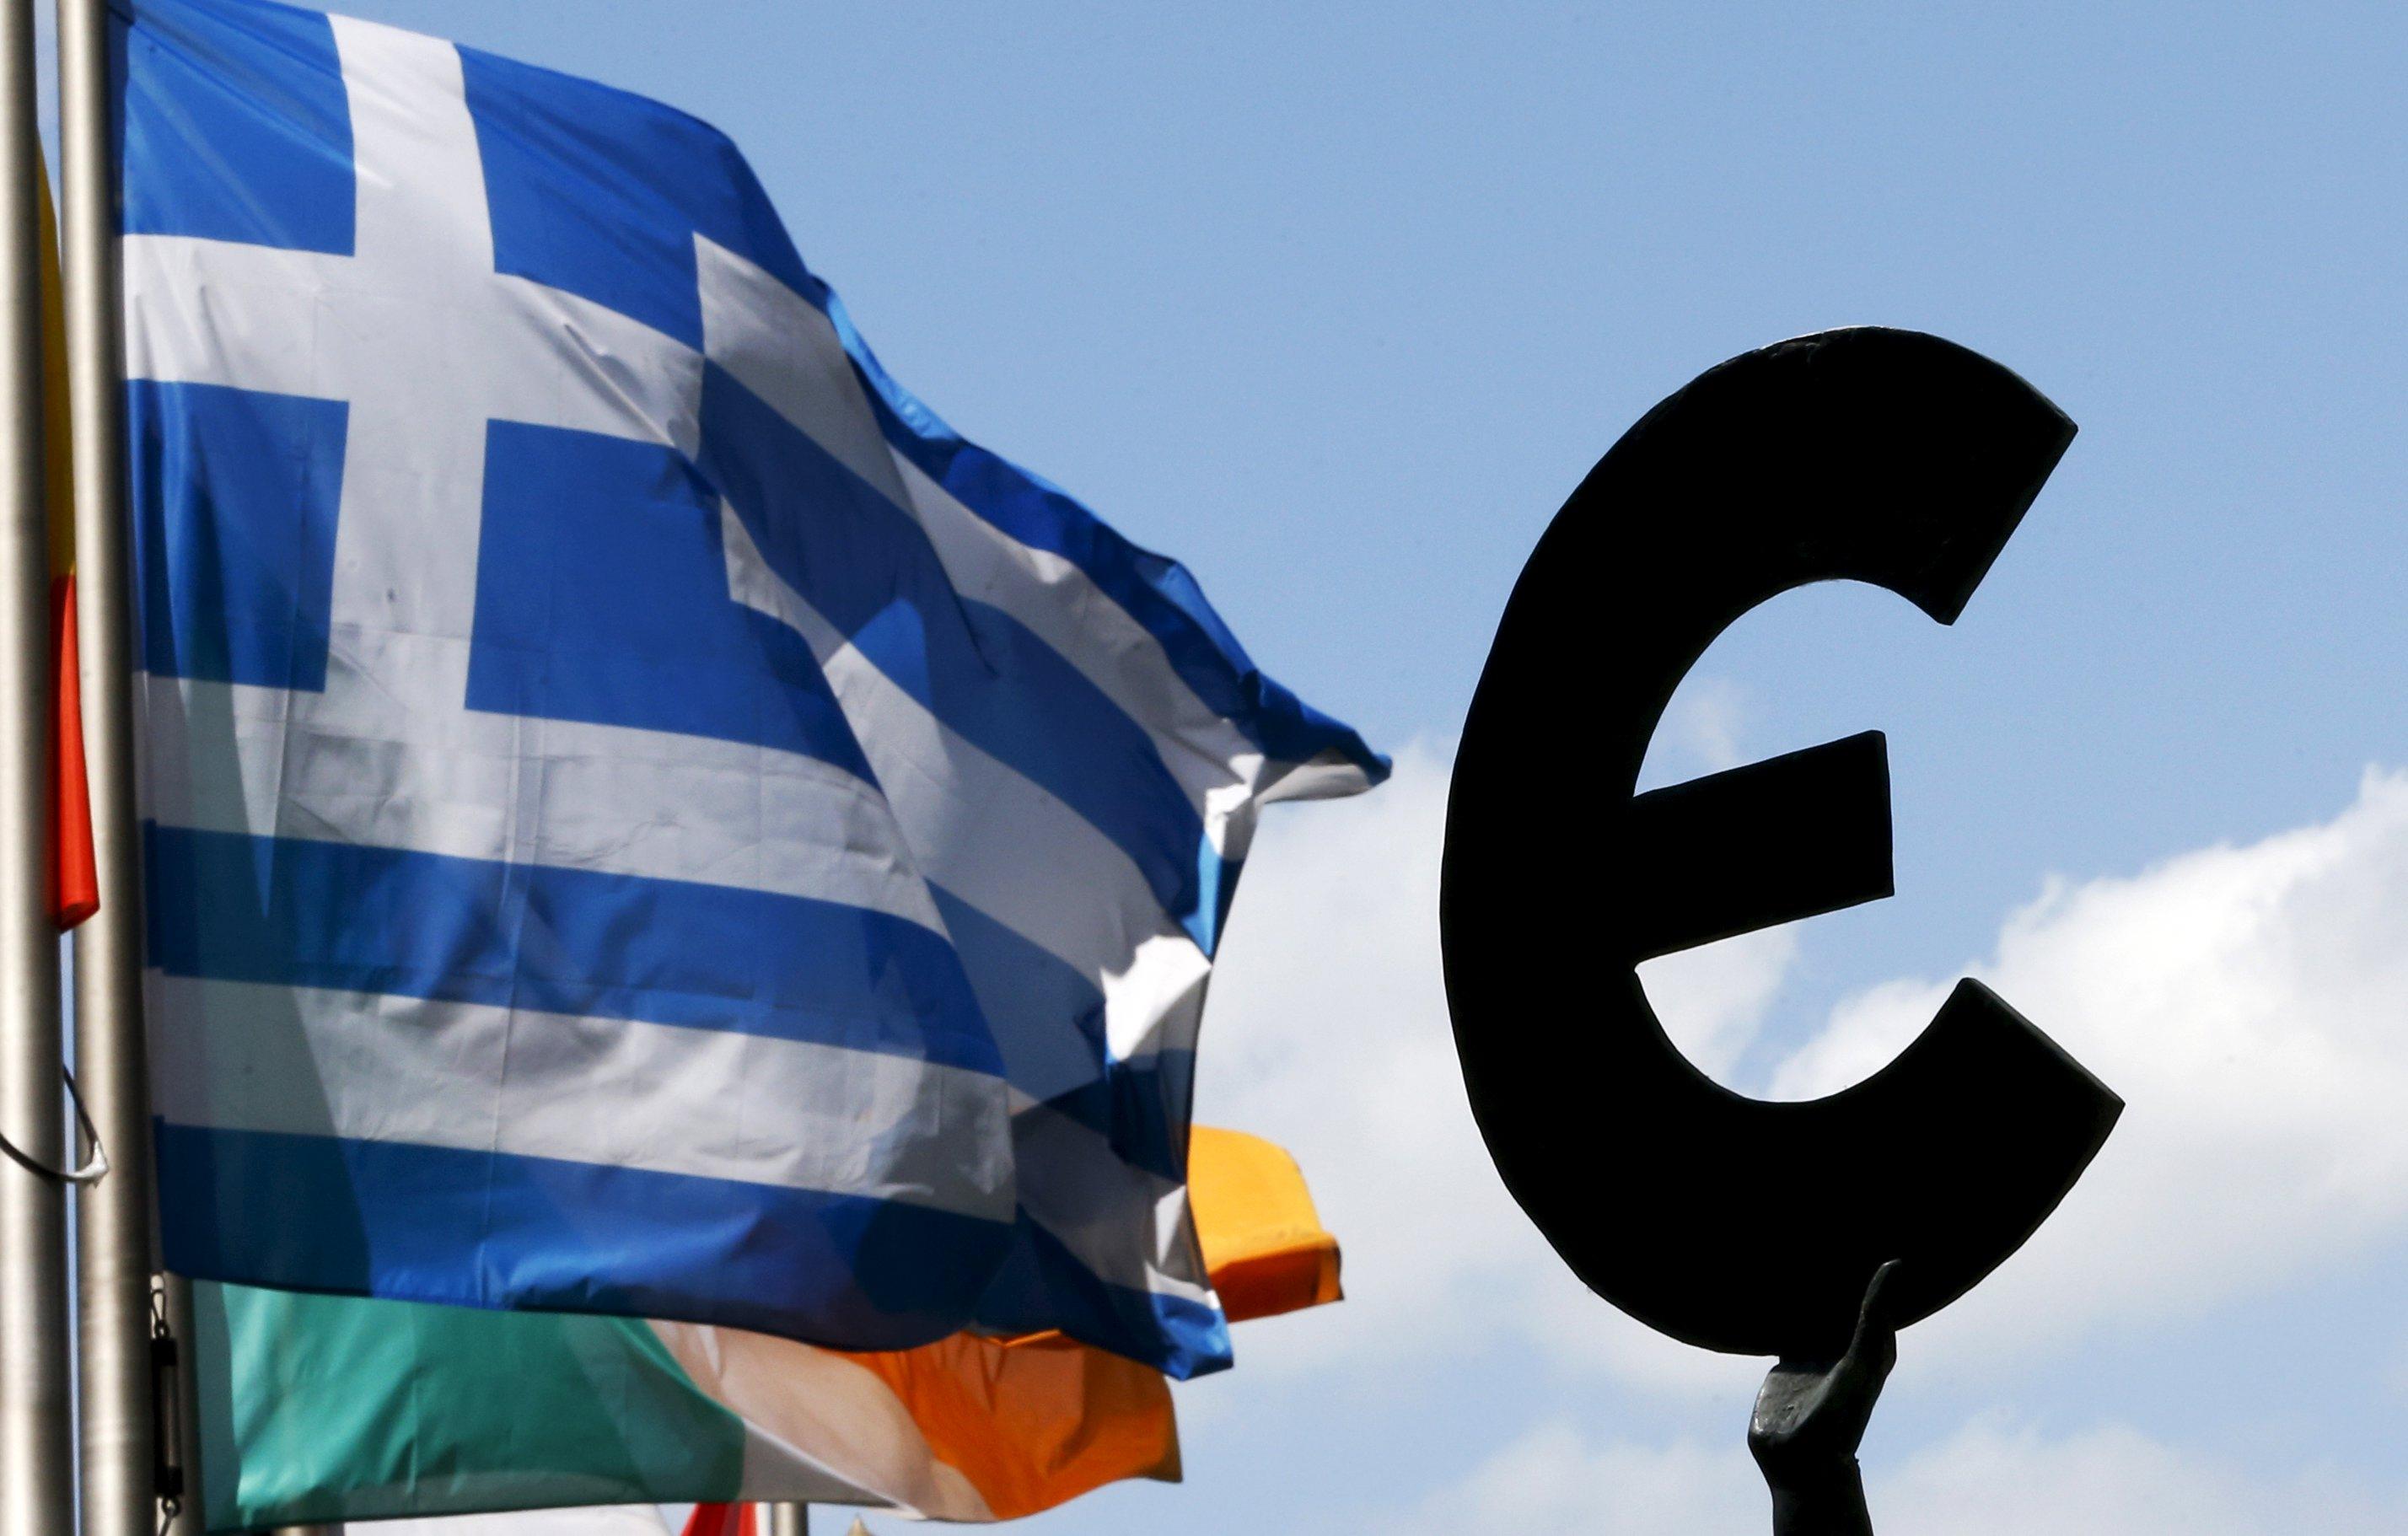 Eurostat: Ελλειμμα 3,6% και χρέος 178,6% για την Ελλάδα το 2014 | tovima.gr